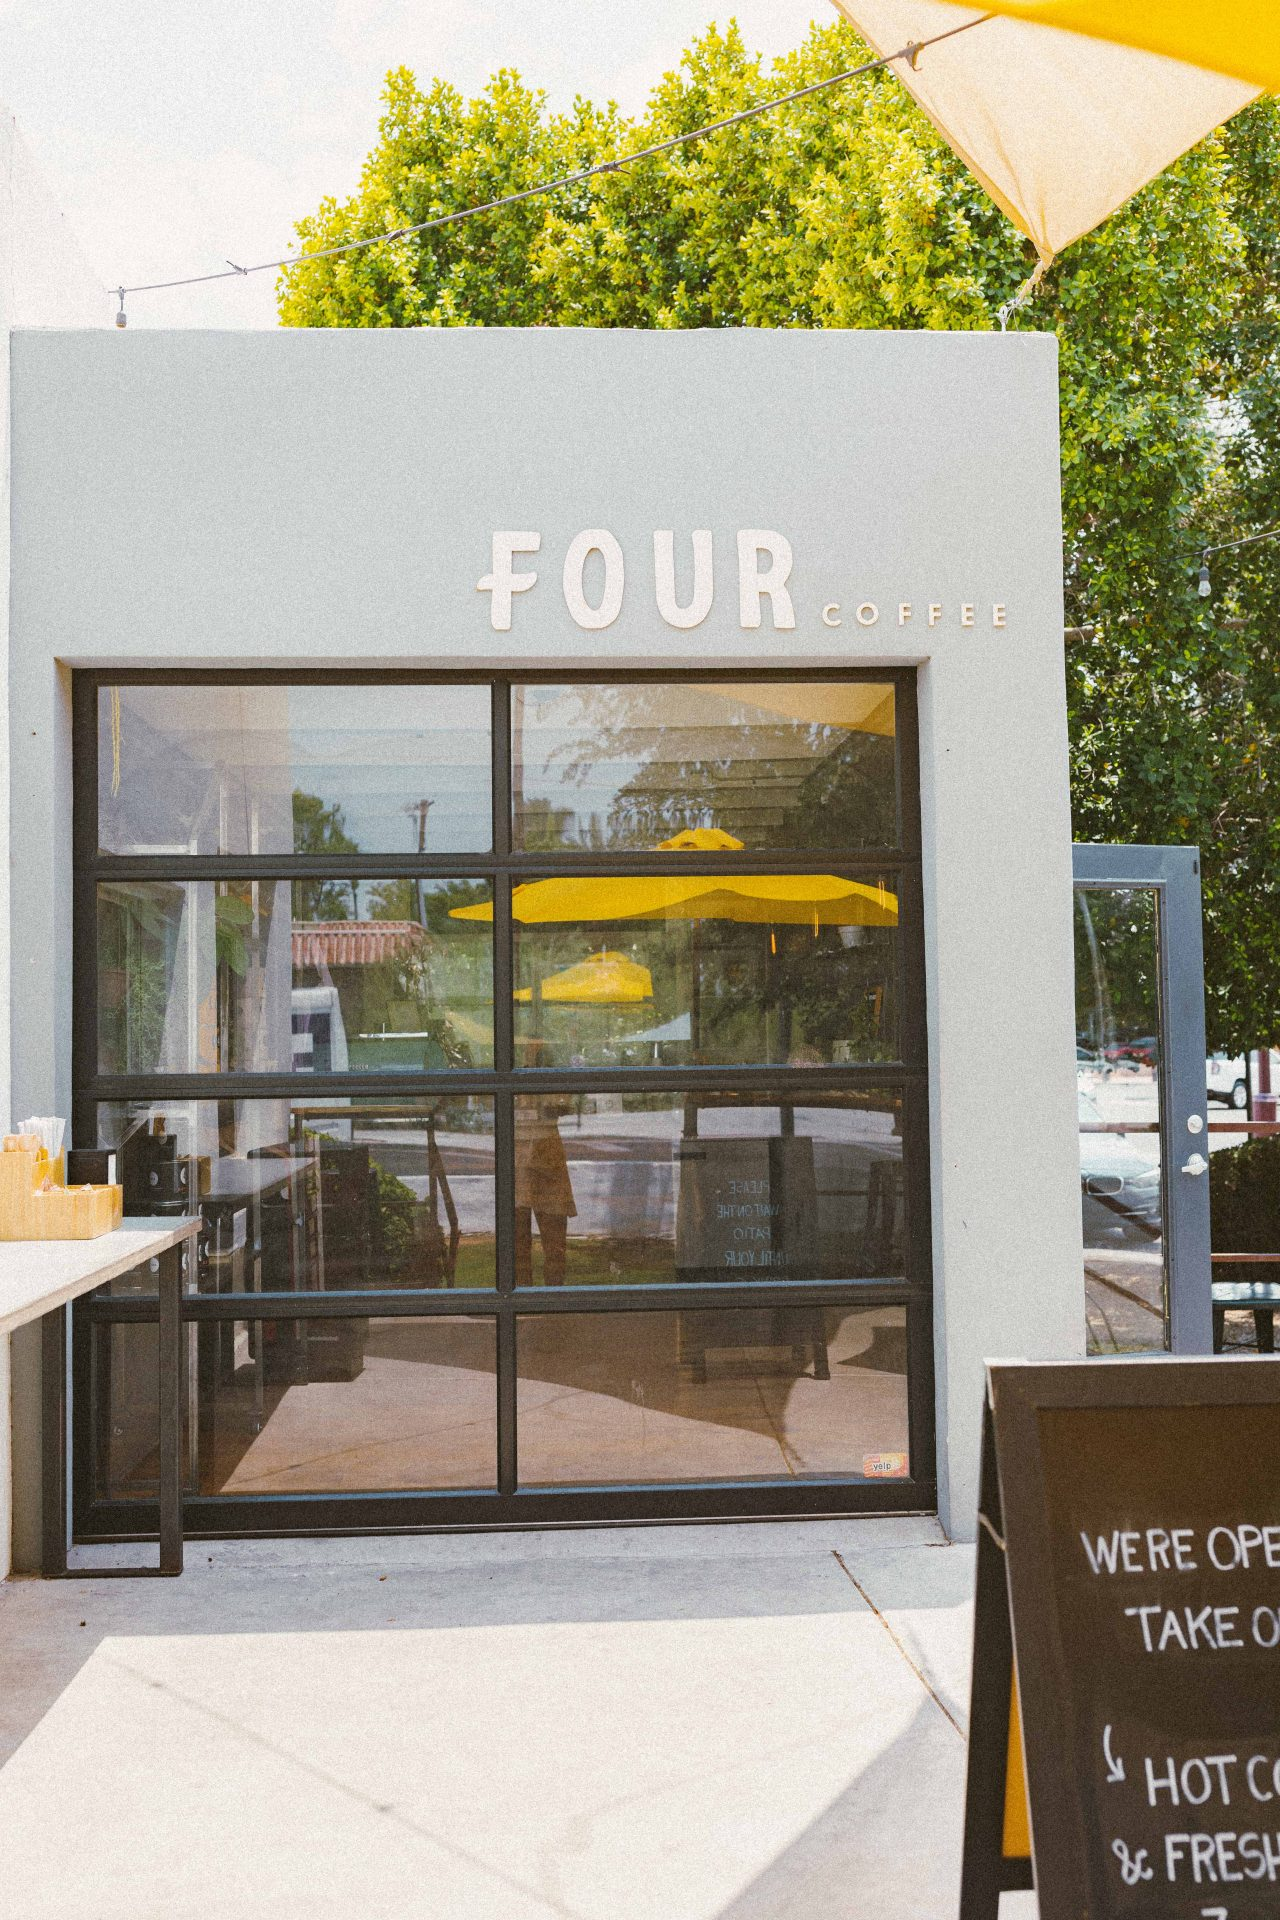 fourtilfour, coffee shops, best coffee shops in scottsdale Arizona, scottsdale Arizona travel guide, blog, blogger scottsdale, coffee, matcha, where to get coffee, old town scottsdale, ultimate guide